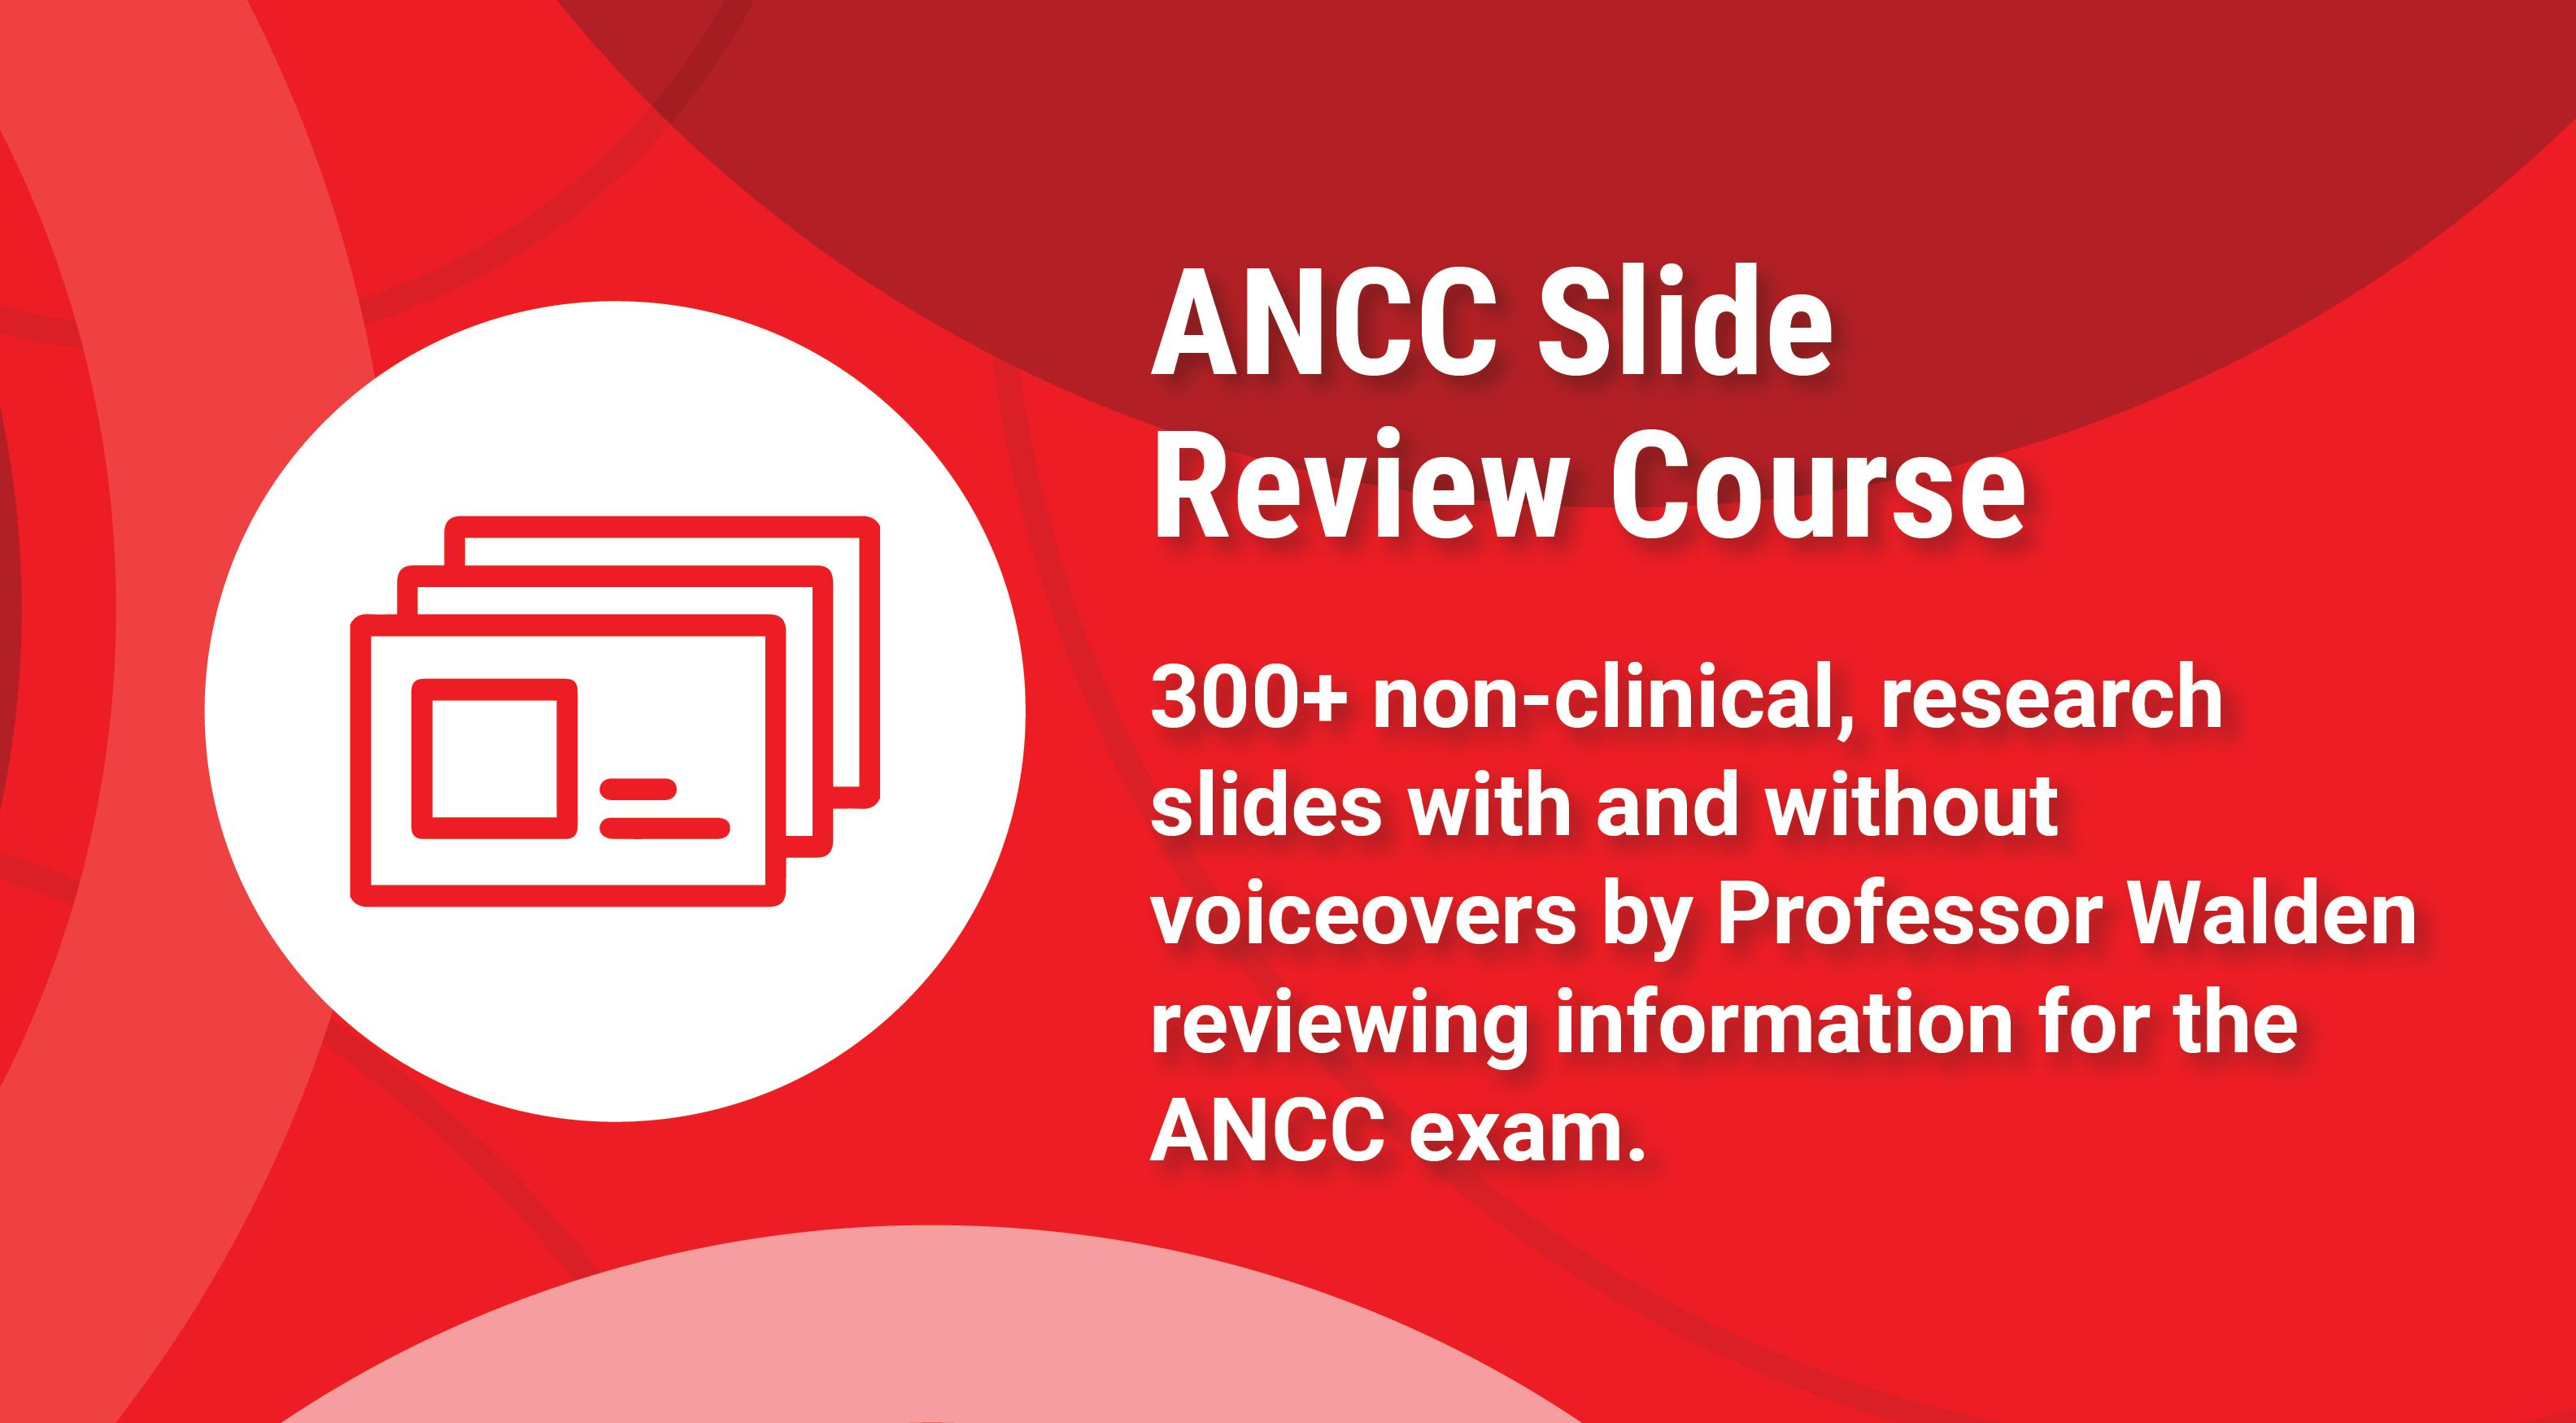 ANCC Slide Review Course